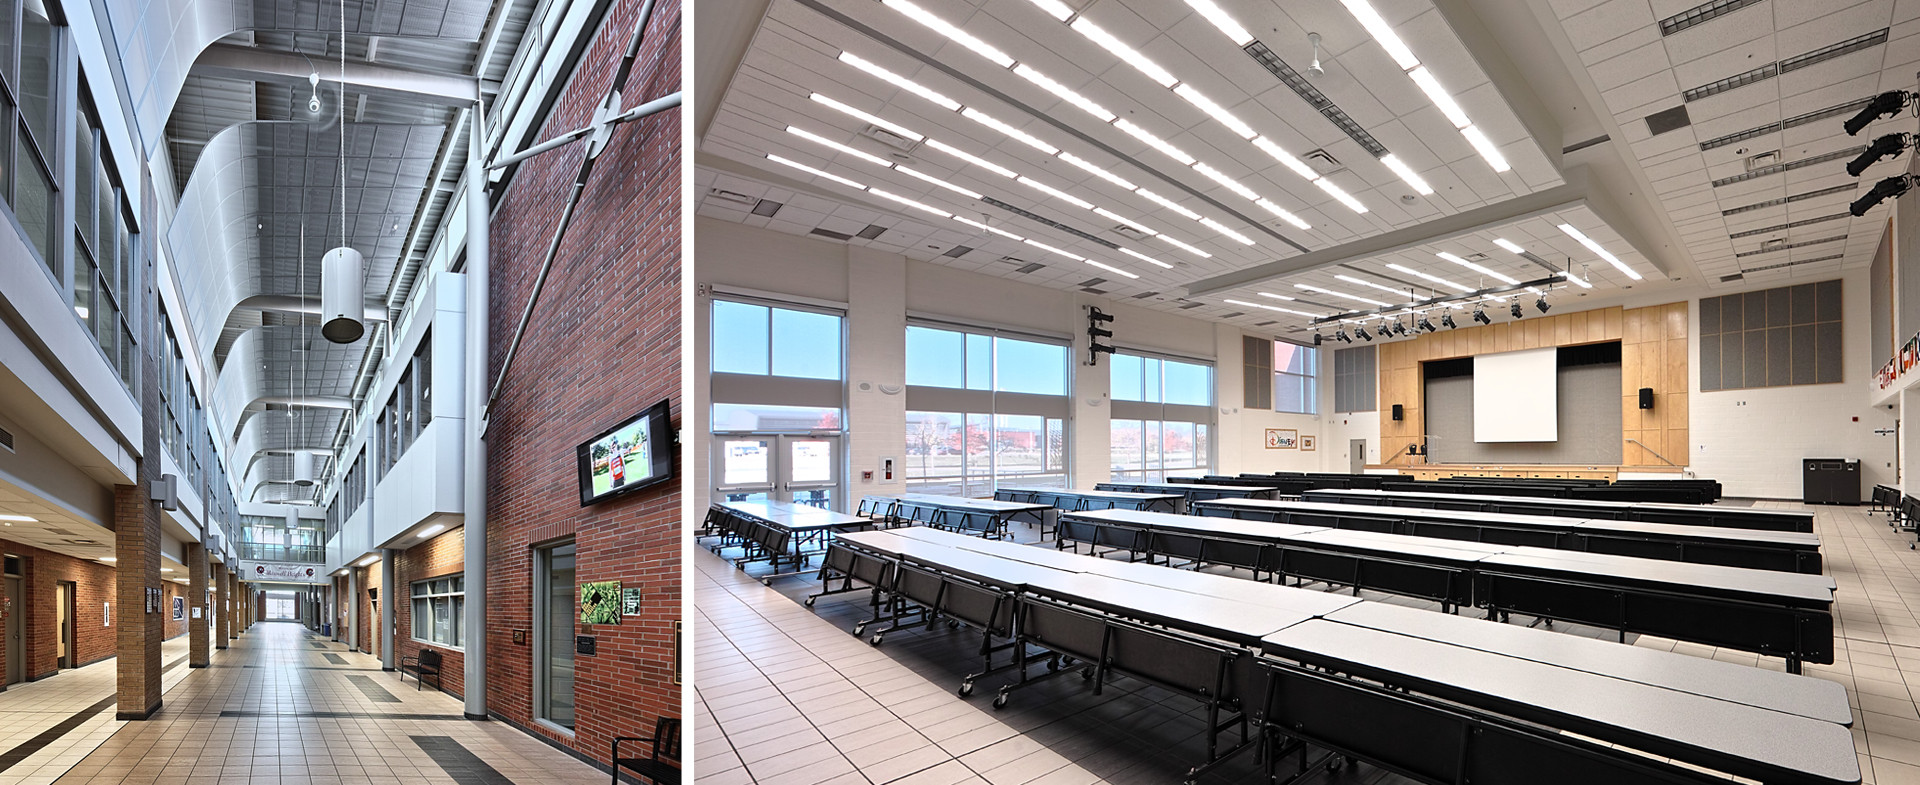 Maxwell-Heights-Secondary-School-3